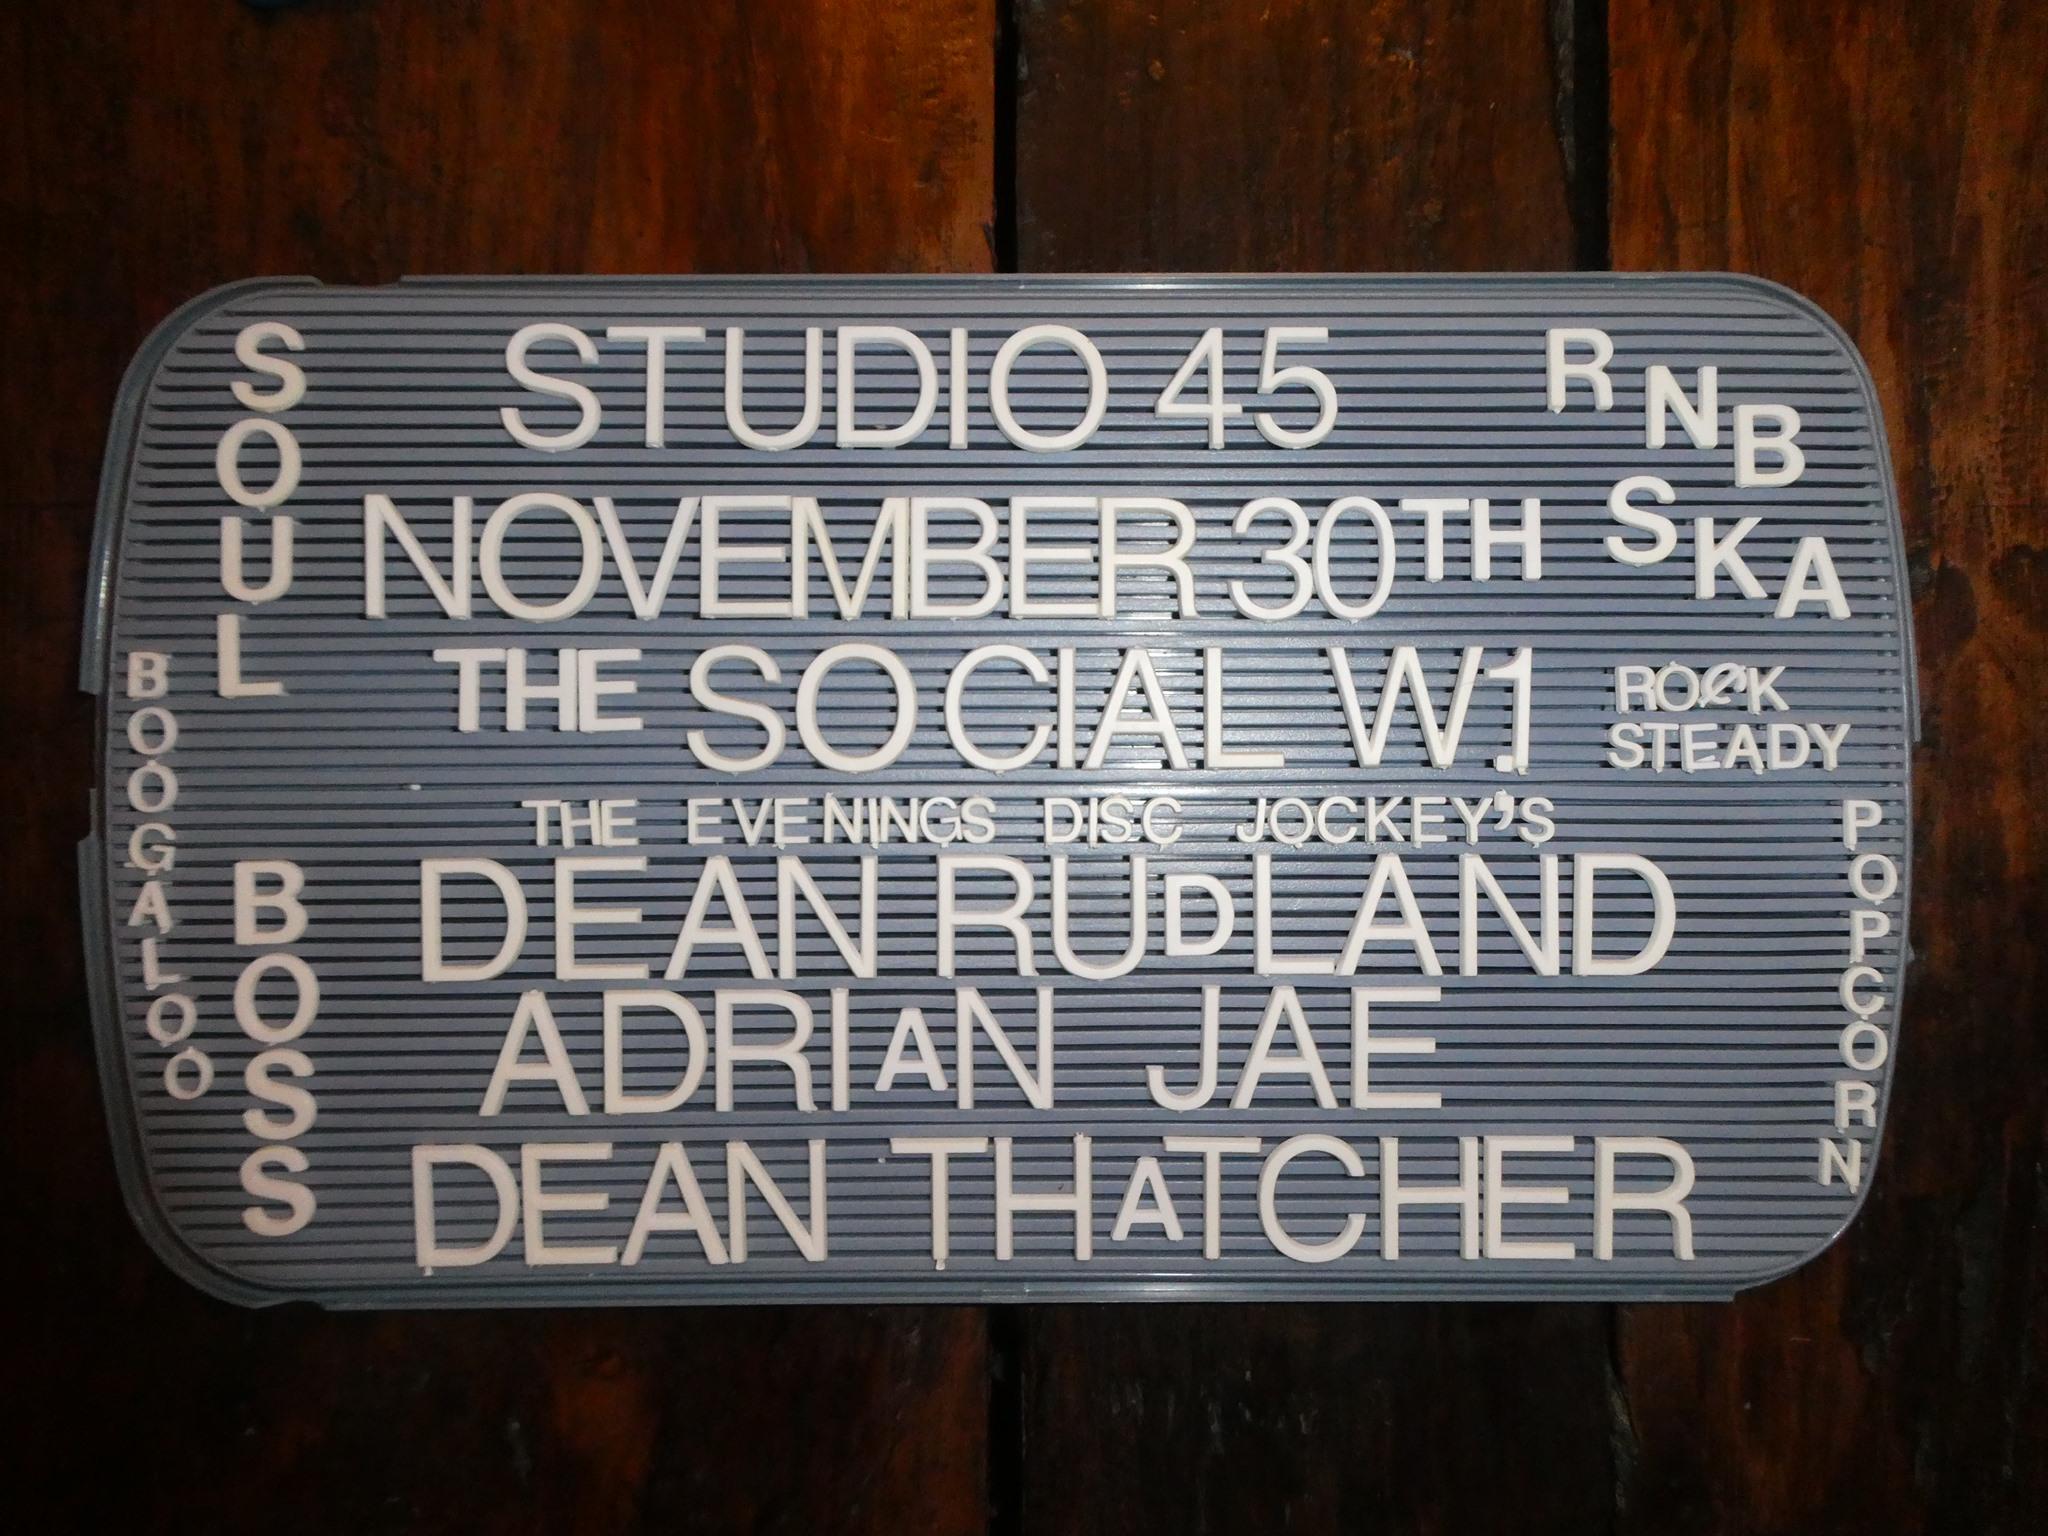 Studio 45 - DJs Dean Thatcher, Dean Rudland & Adrian Jae. 5 Little Portland Street, London, W1W 7JD. Playing rare Soul, 60s Soul, Popcorn, 60s R&B, Ska, Rocksteady & Reggae. 30/11/19